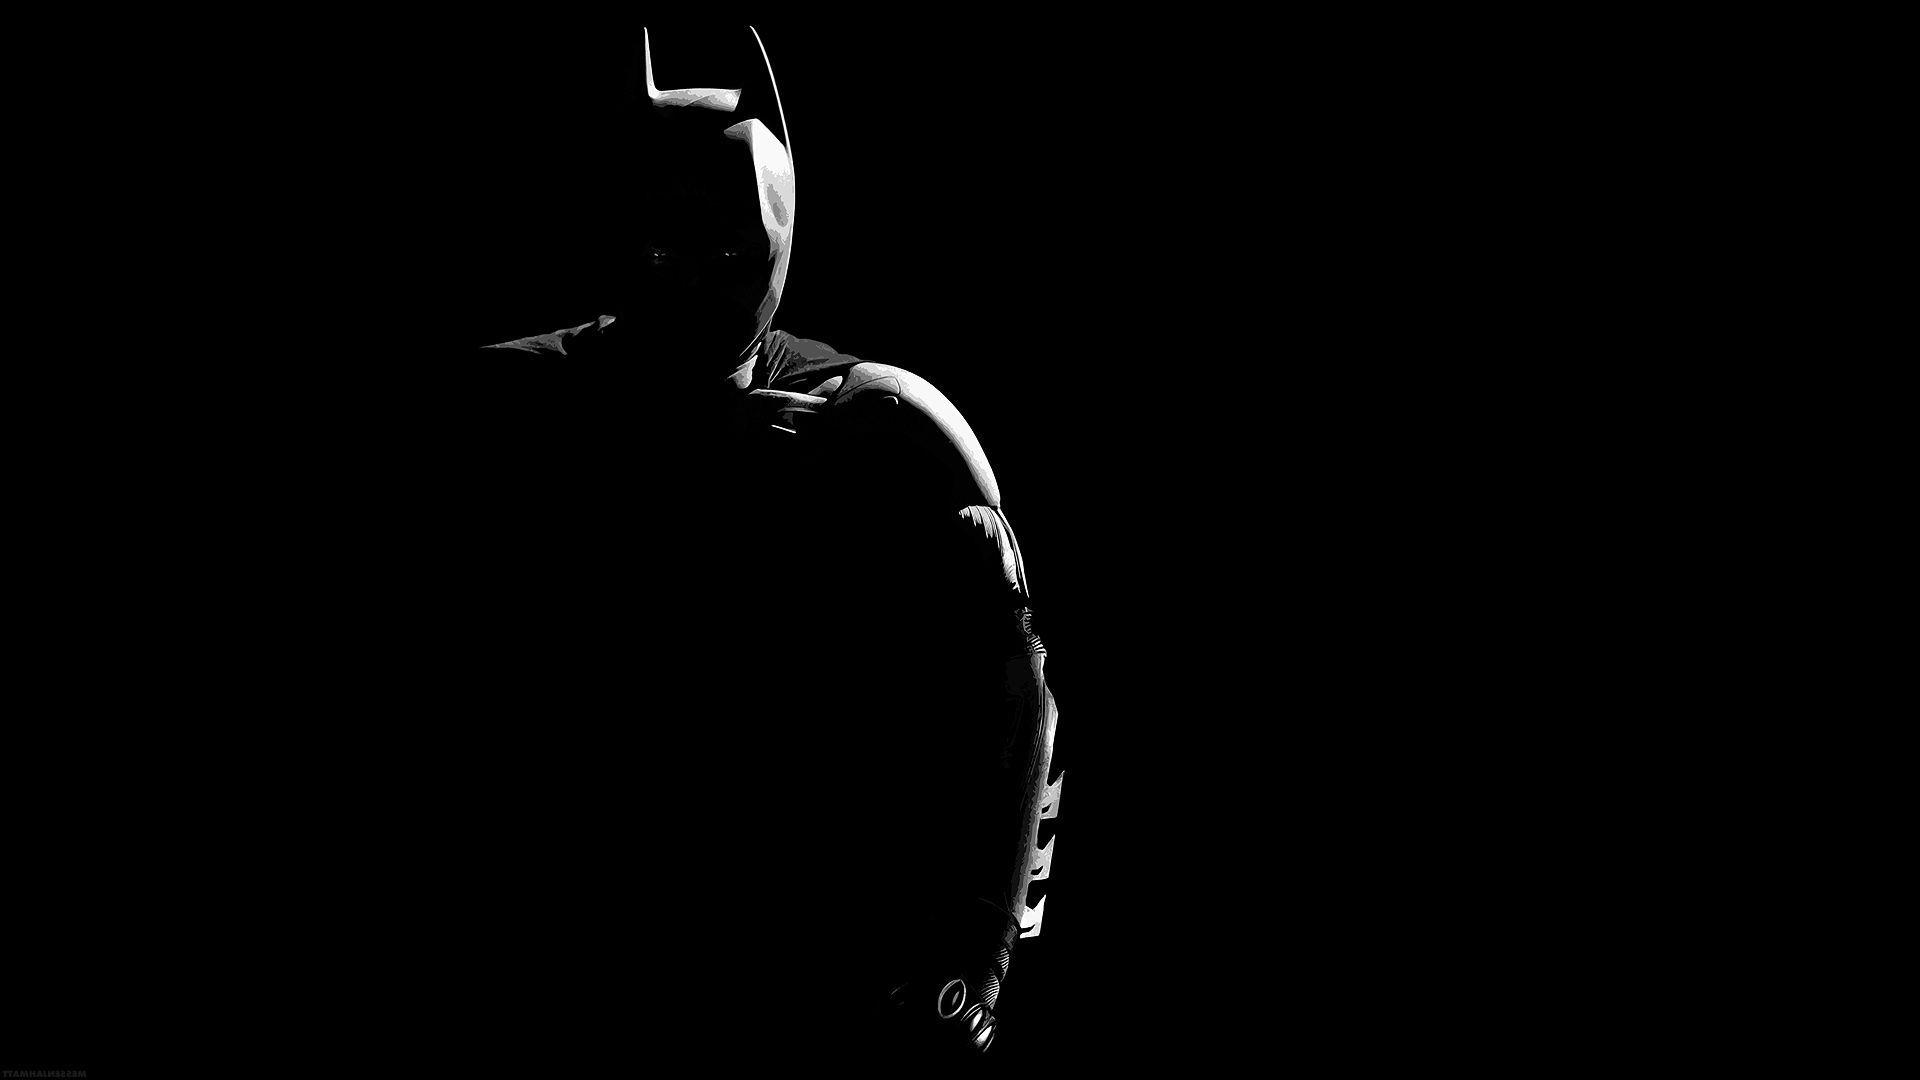 Dark Batman Movies Cover Wallpaper HD Wallpaper with 1920x1080 1920x1080